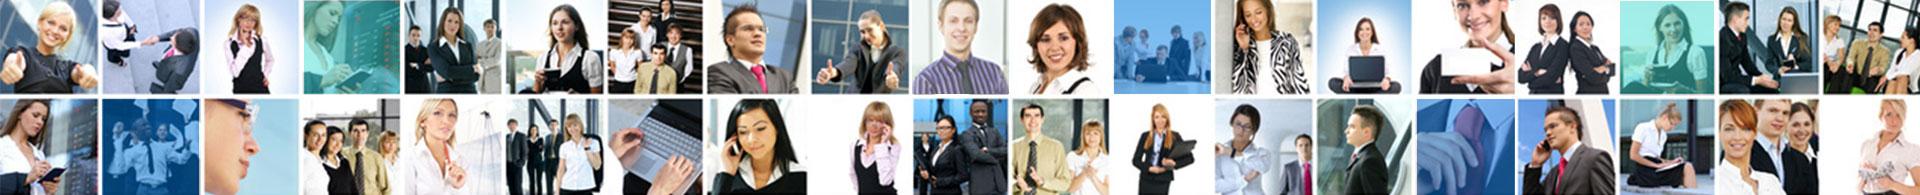 SMB Recruiters LLC